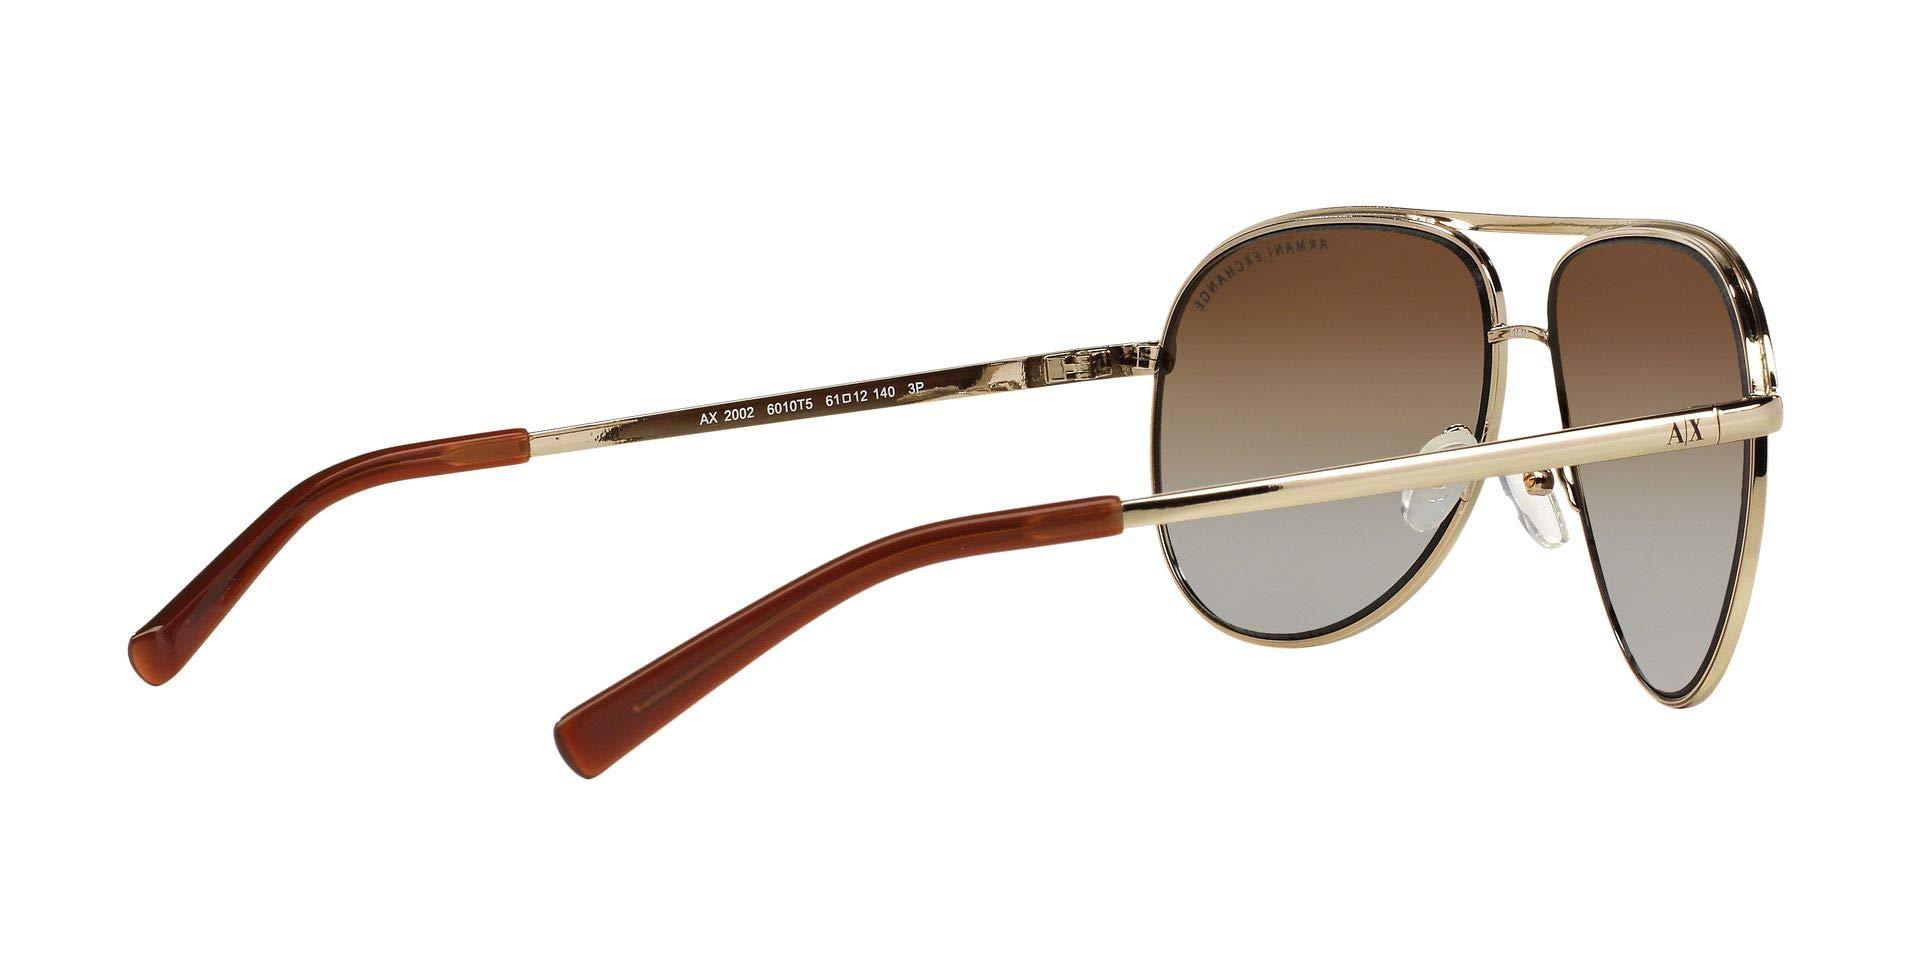 Armani Exchange Metal Unisex Polarized Aviator Sunglasses, Light Gold/Dark Brown, 61 mm by A|X Armani Exchange (Image #10)